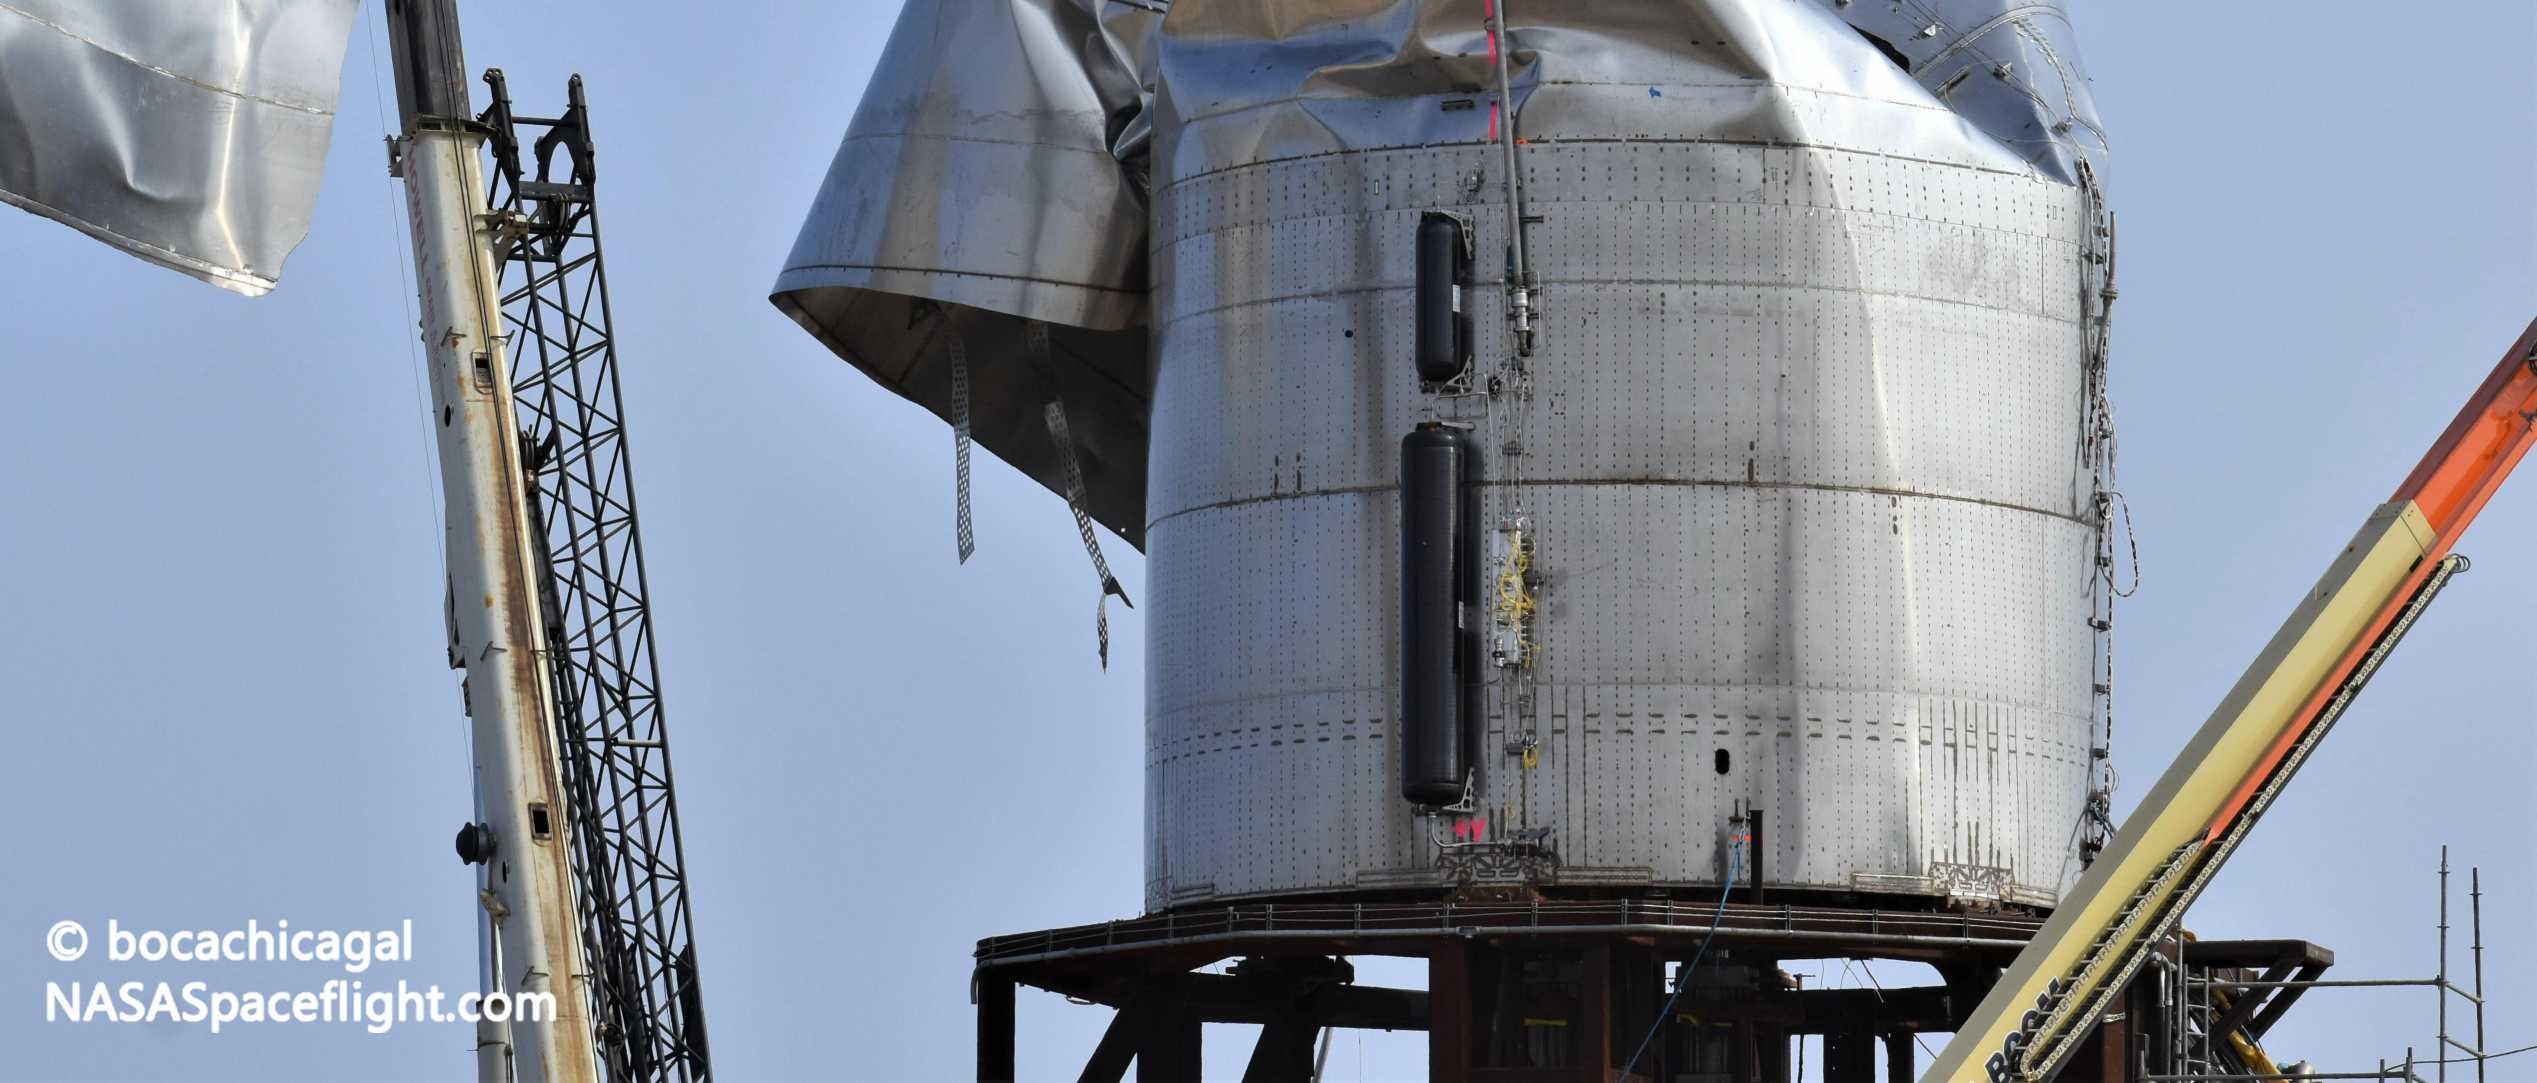 Starship Boca Chica 040320 (NASASpaceflight – bocachicagal) SN3 engine section 5 crop (c)